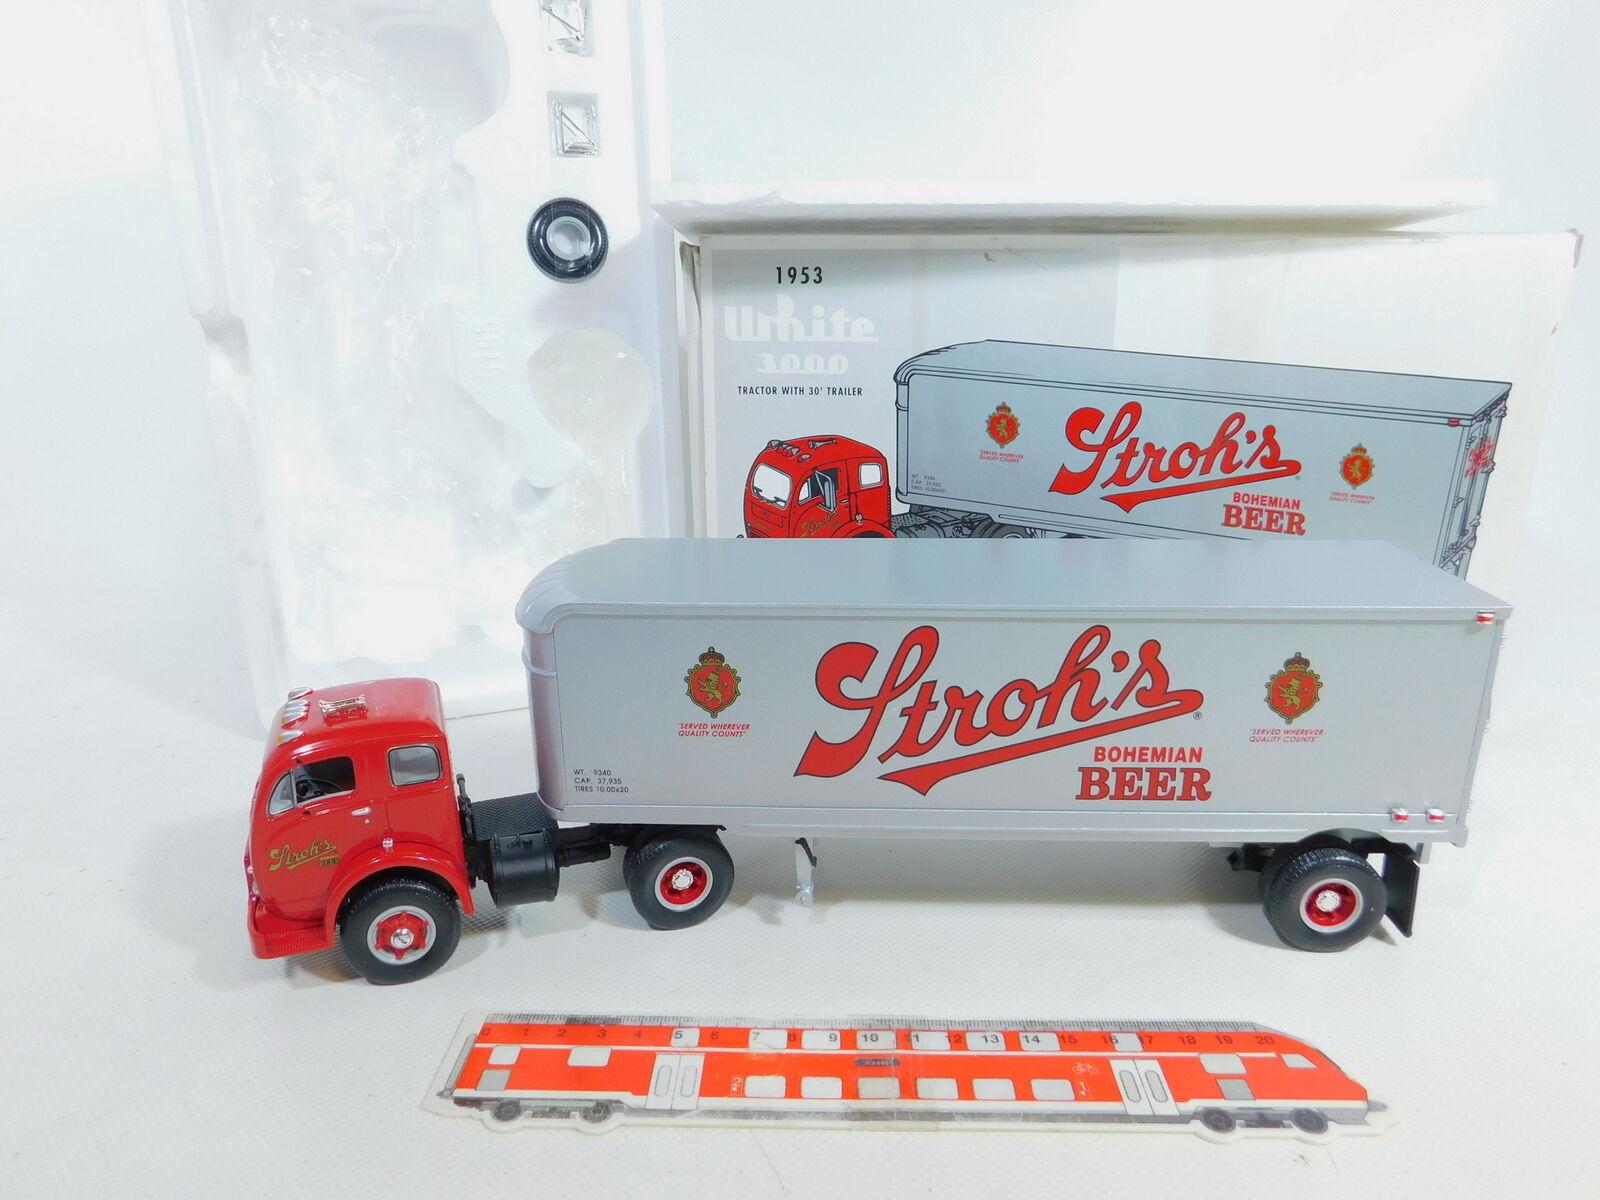 CA101-2; primero Gear 1 3 4 19-1917 Truck bianca 3000 1953 Stroh's Beer, Mint scatola